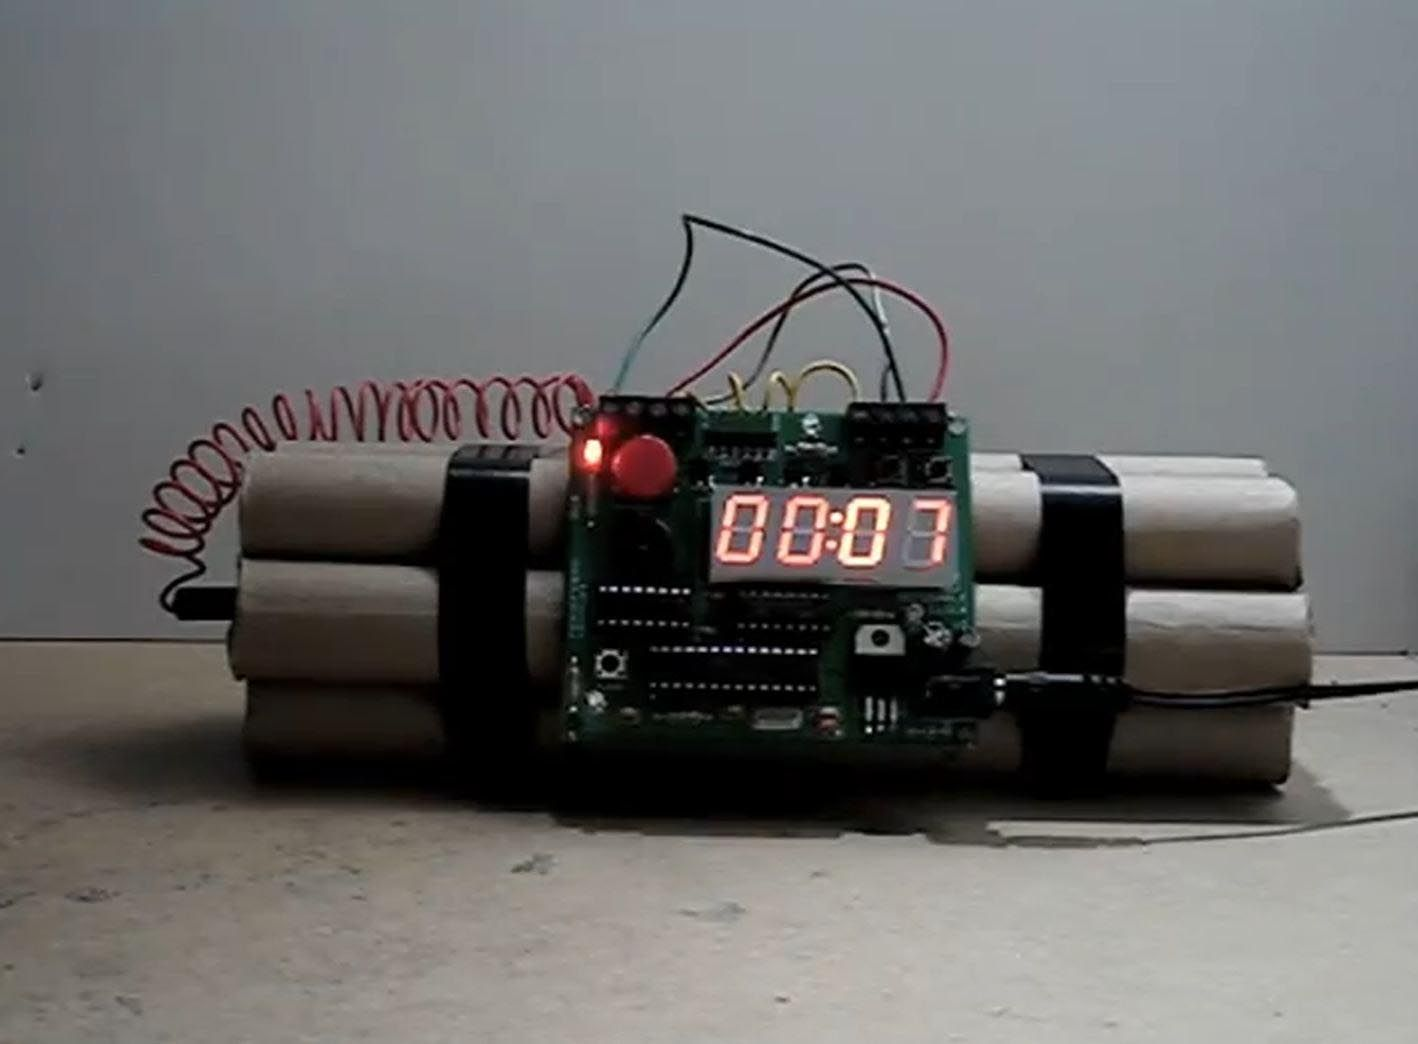 Cool Digital Alarm Clocks Clock Alarm Clock Cool Digital Clocks